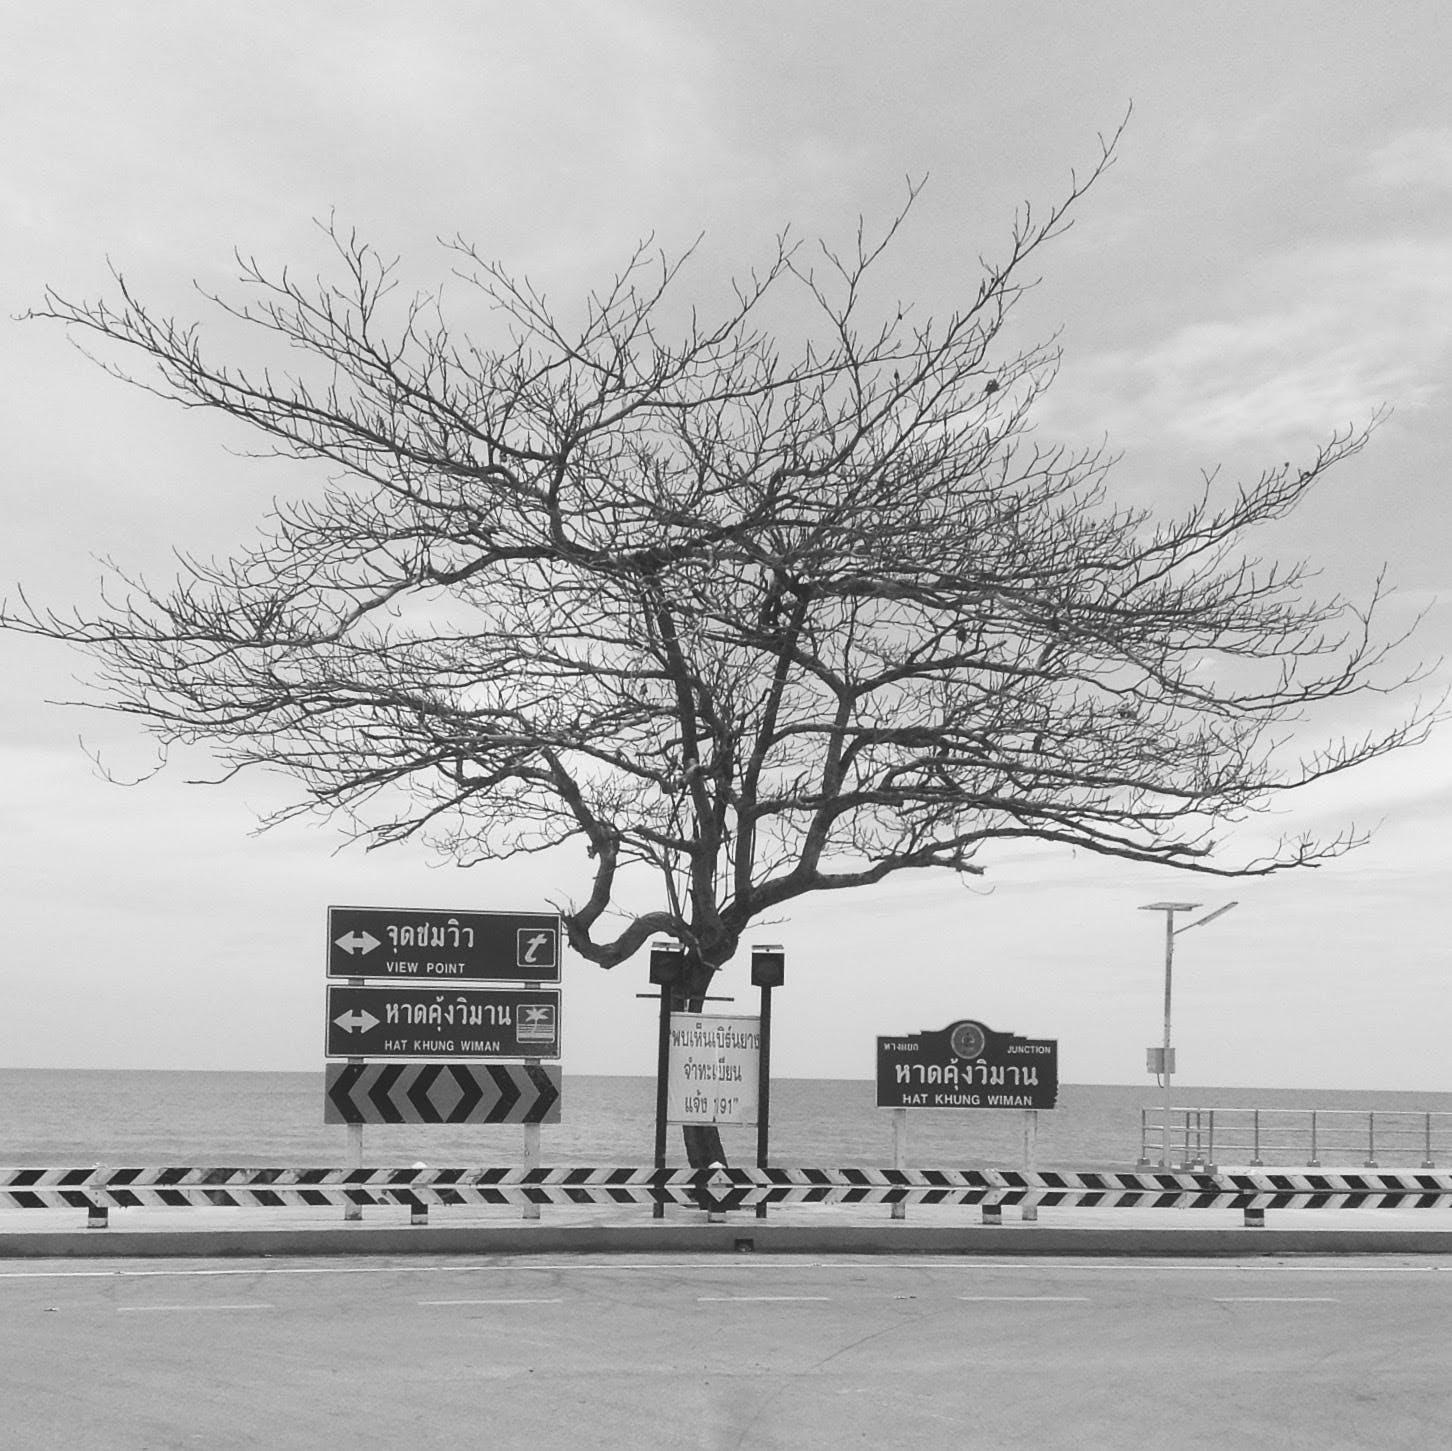 Free stock photo of beach, bw, monochrome, monochrome photography